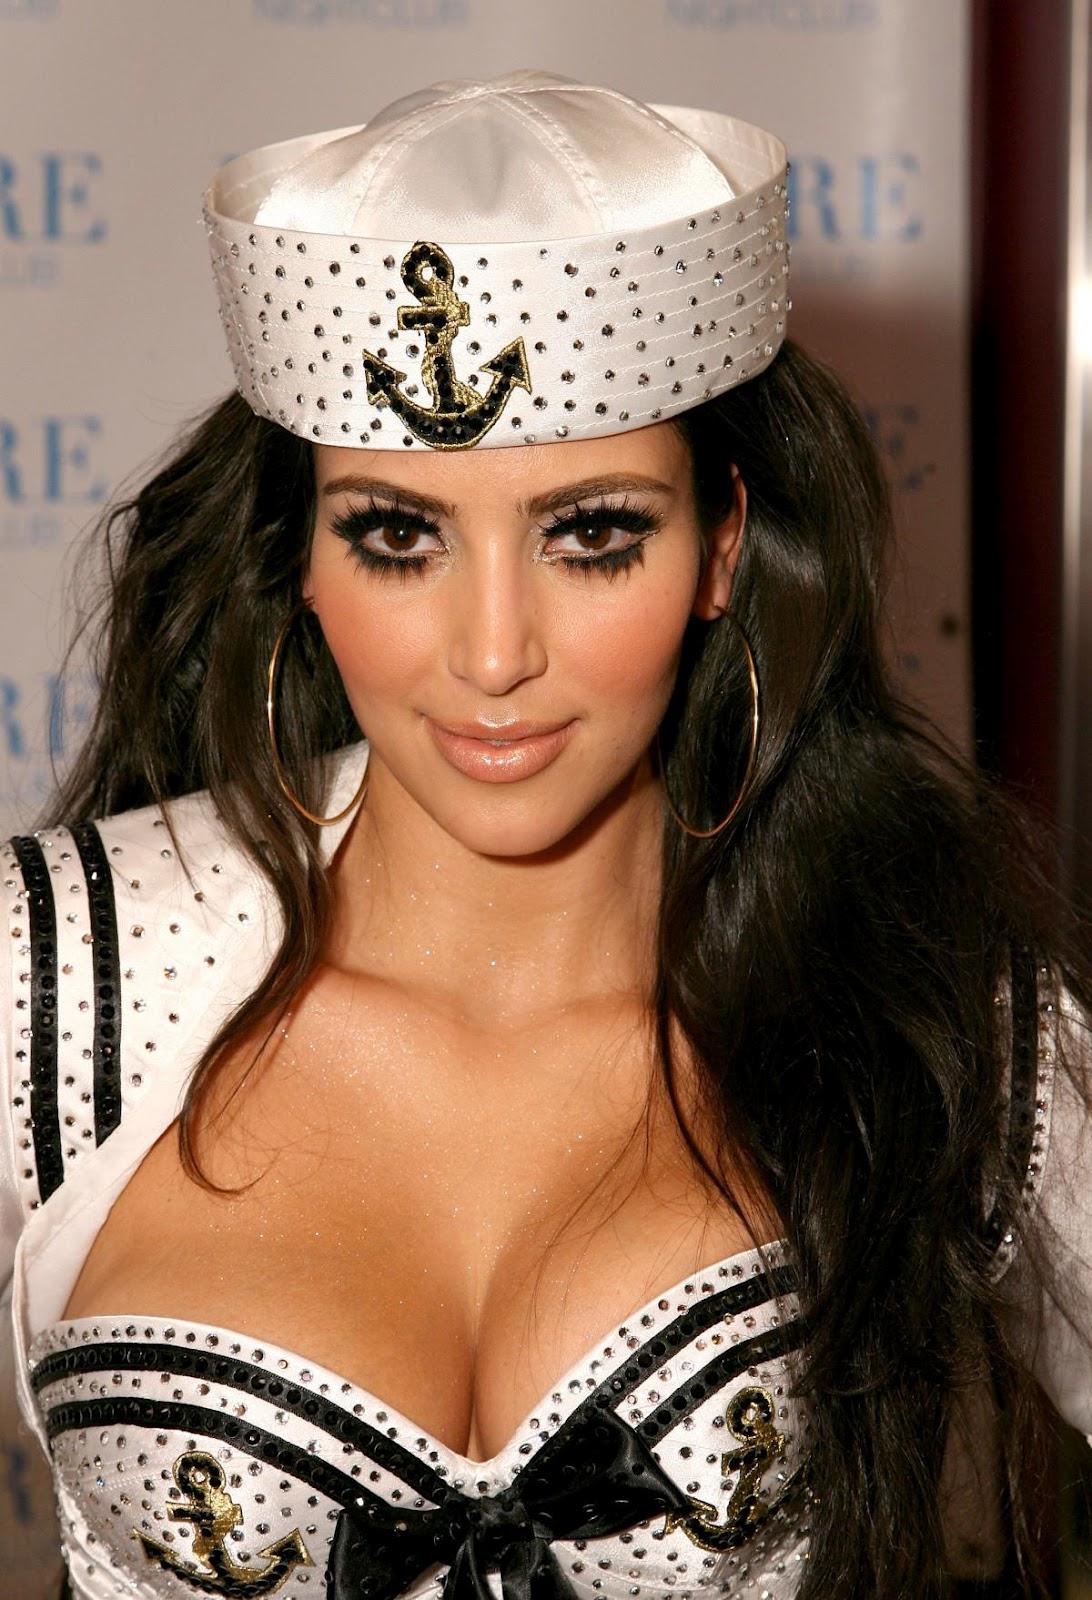 http://1.bp.blogspot.com/-x-WDoUDNq4k/UFBz6SHCIhI/AAAAAAAABUU/vY49O7HMJsk/s1600/kim-kardashian-pussycat-dolls-8.jpg